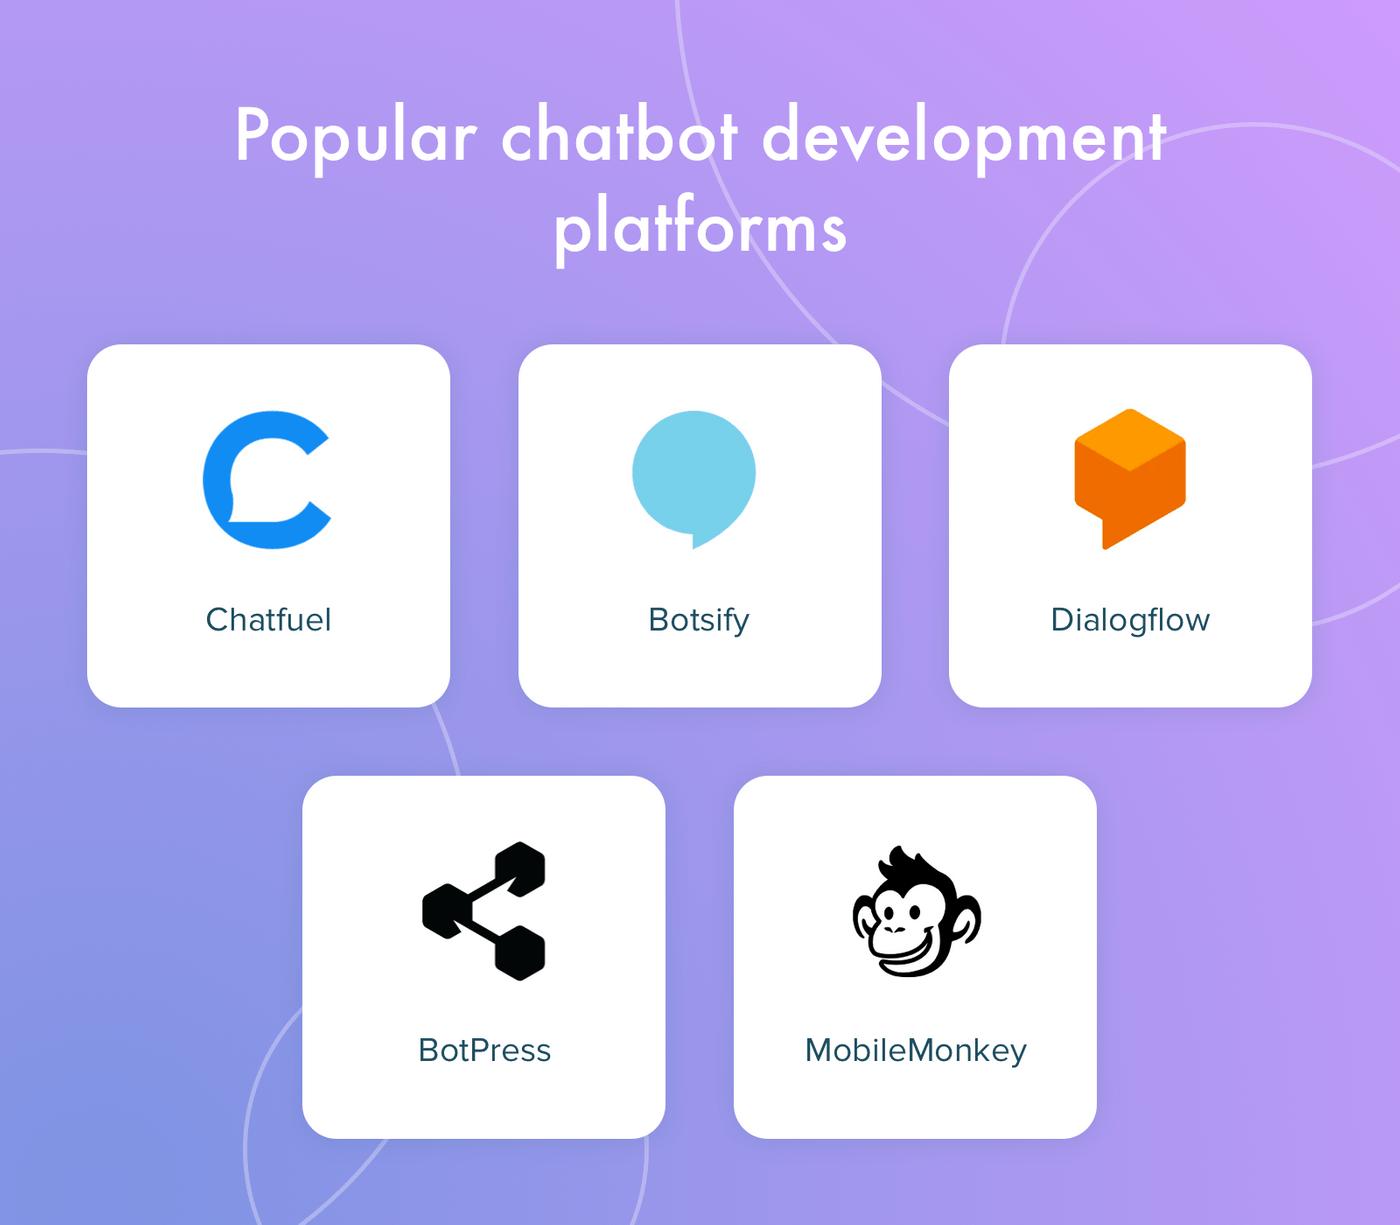 Top 5 chatbot development platforms